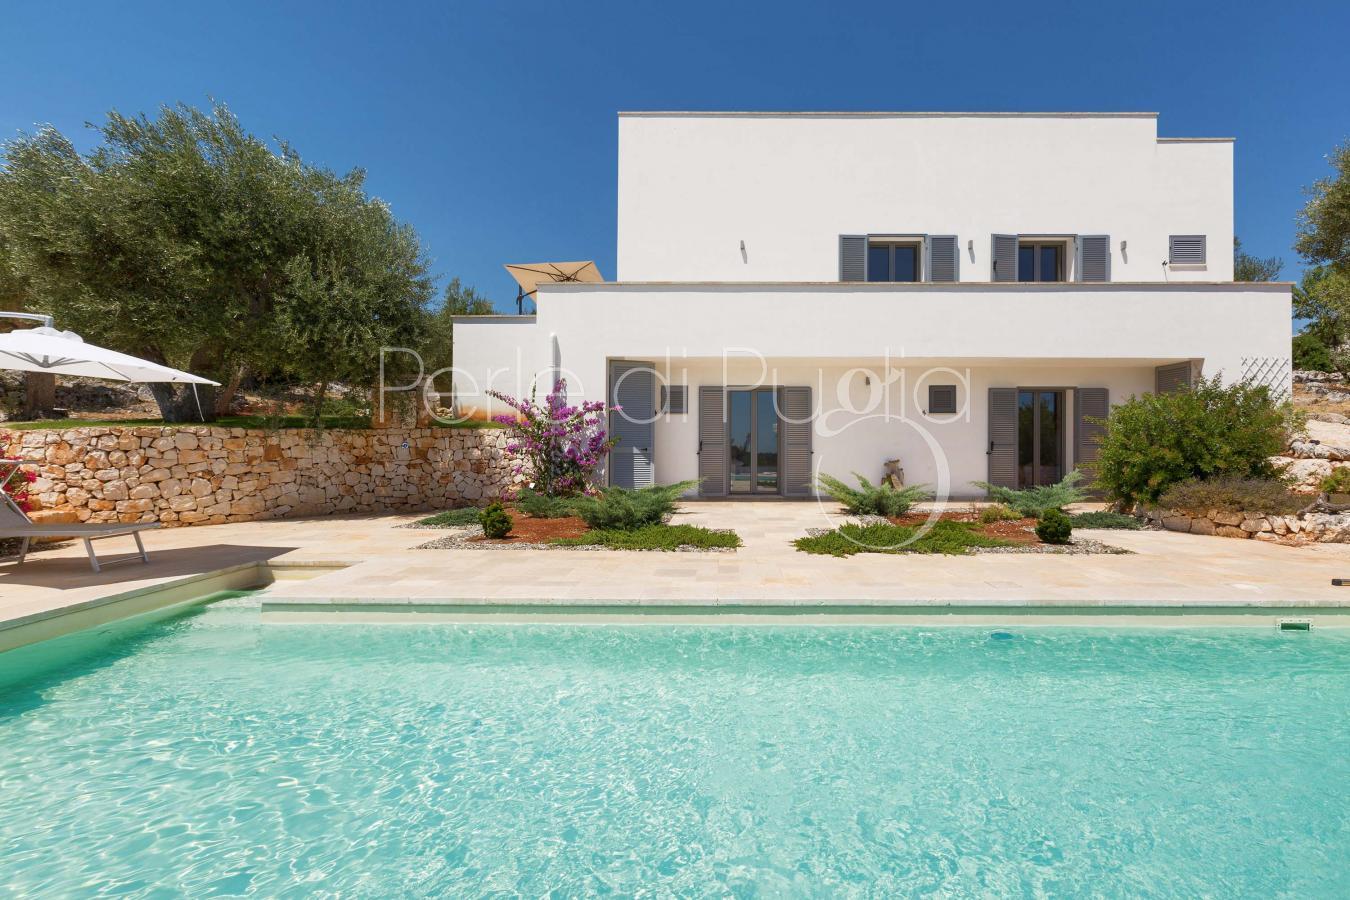 Villa con piscina e vista panoramica in affitto a ostuni - Villa in affitto con piscina ...